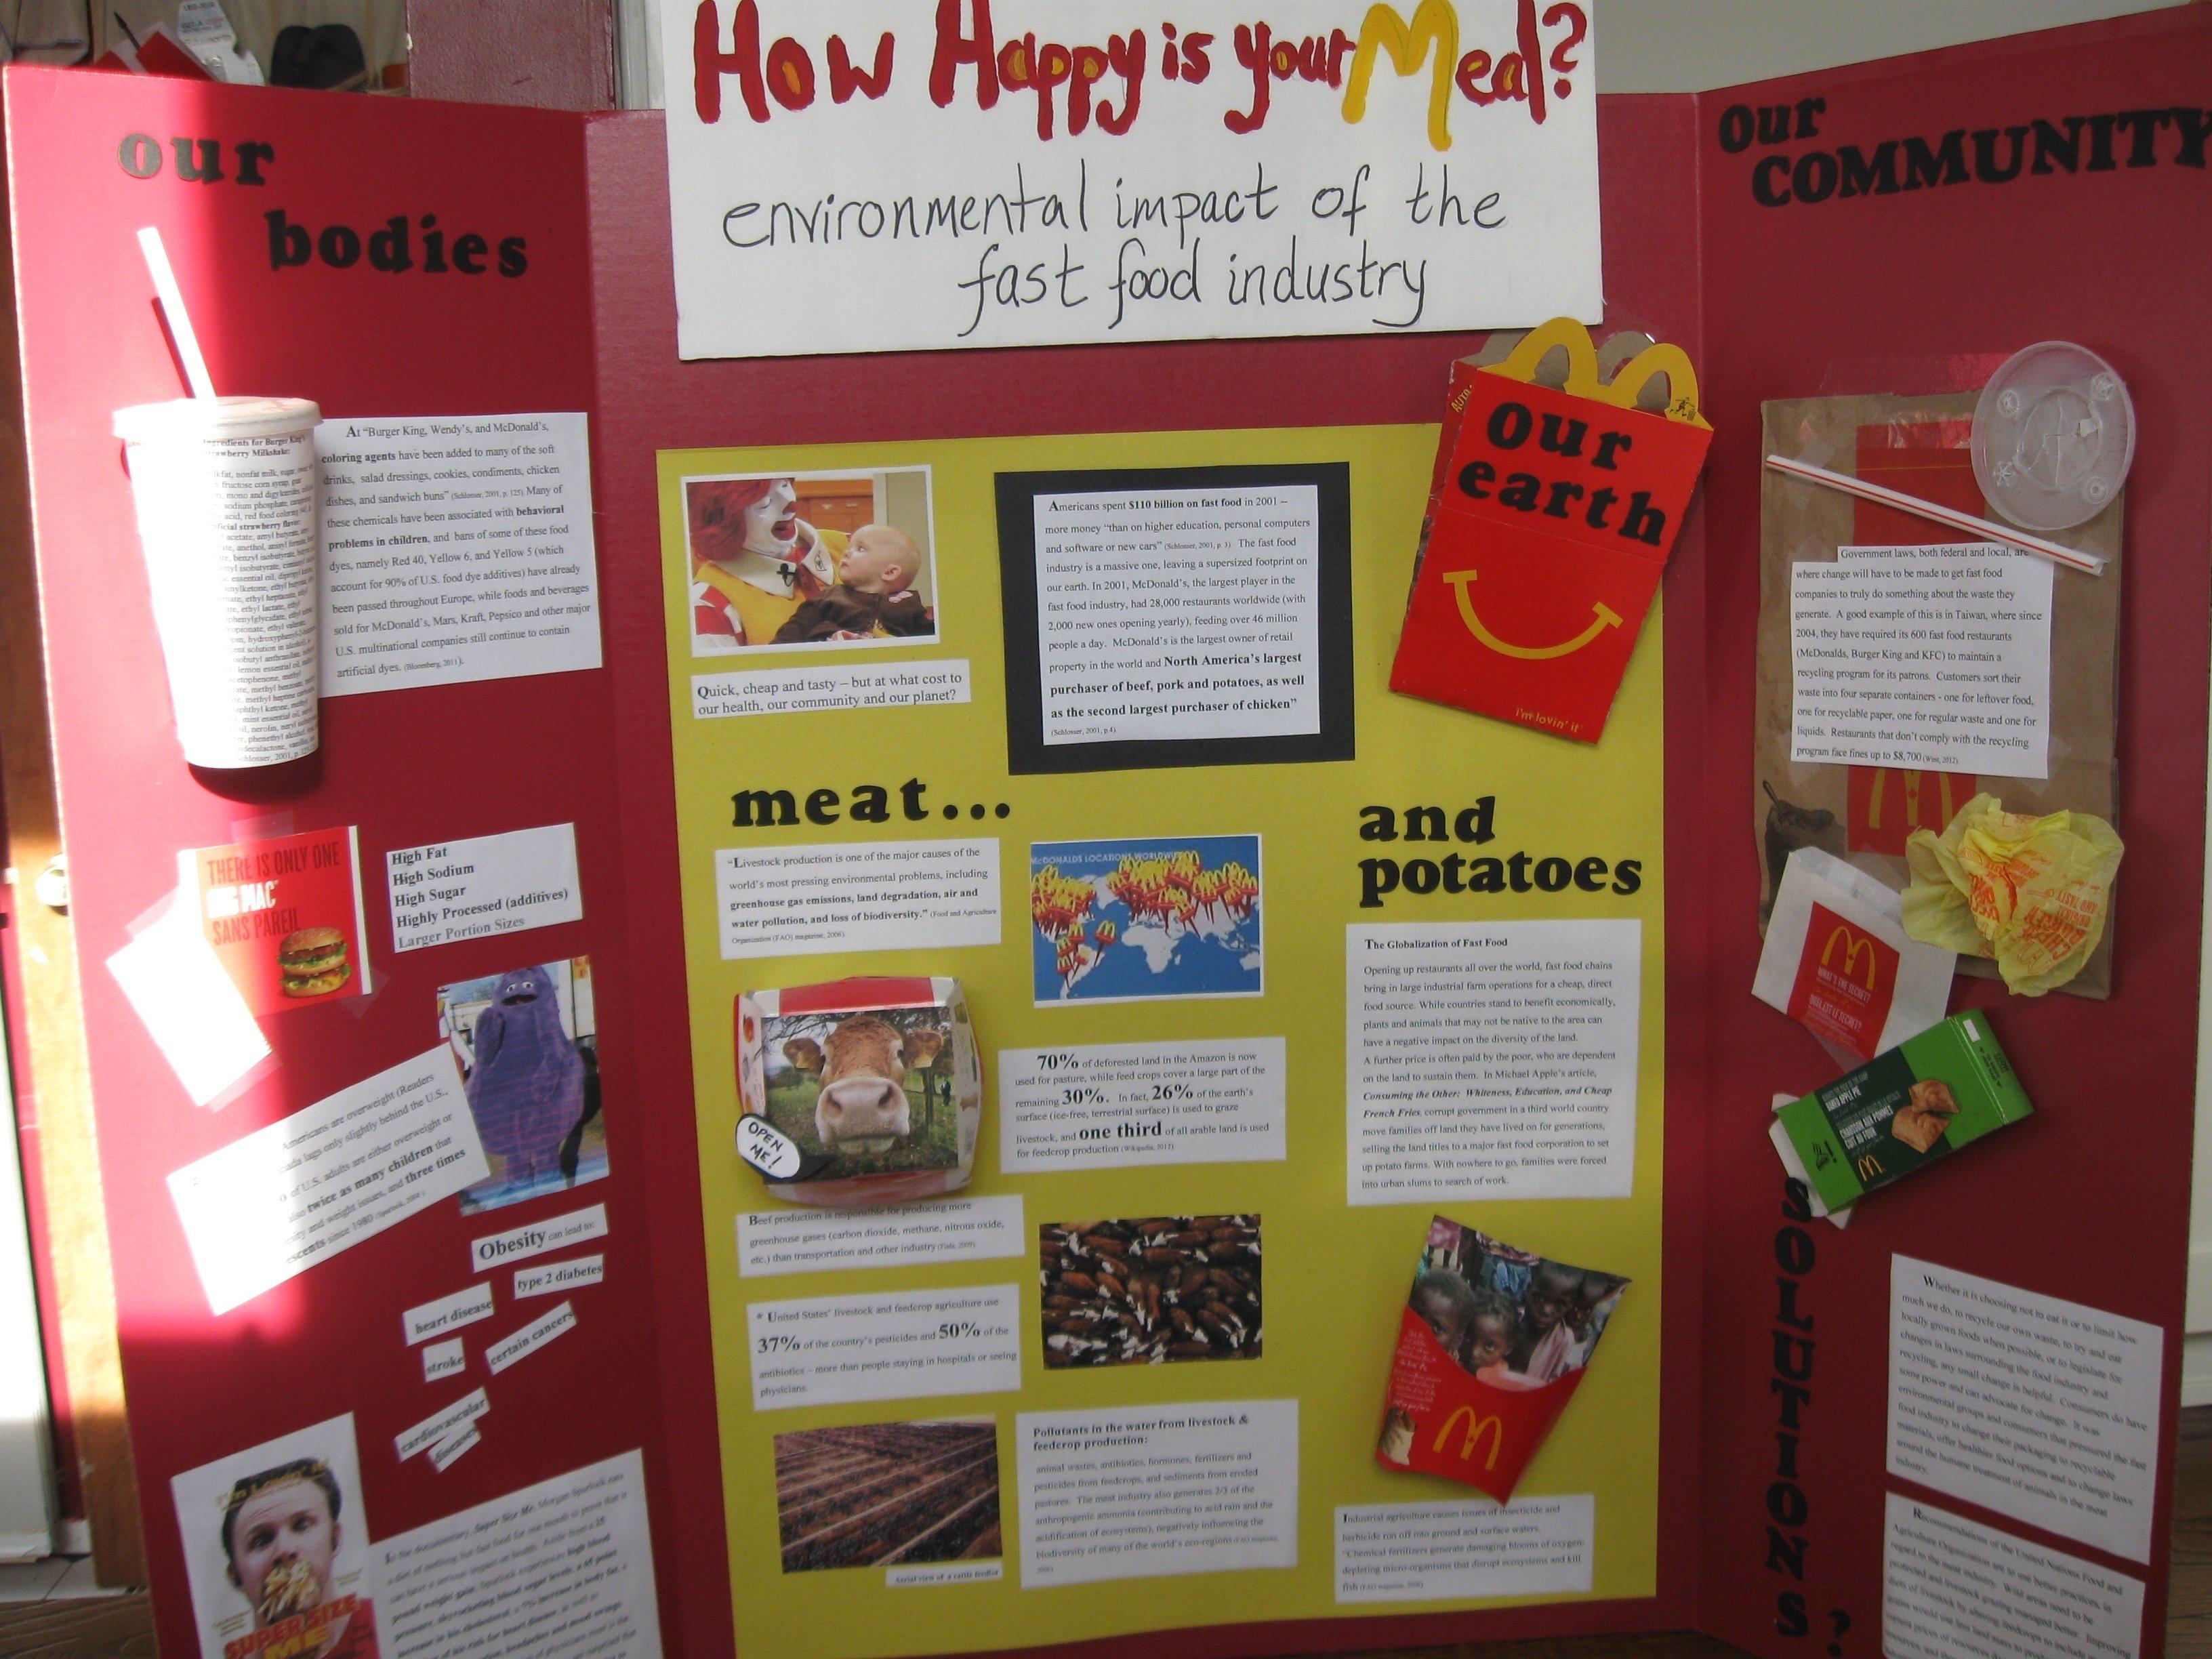 10 Pretty Science Buddies Science Fair Ideas science fair projects for 4th grade google search science fair 2020